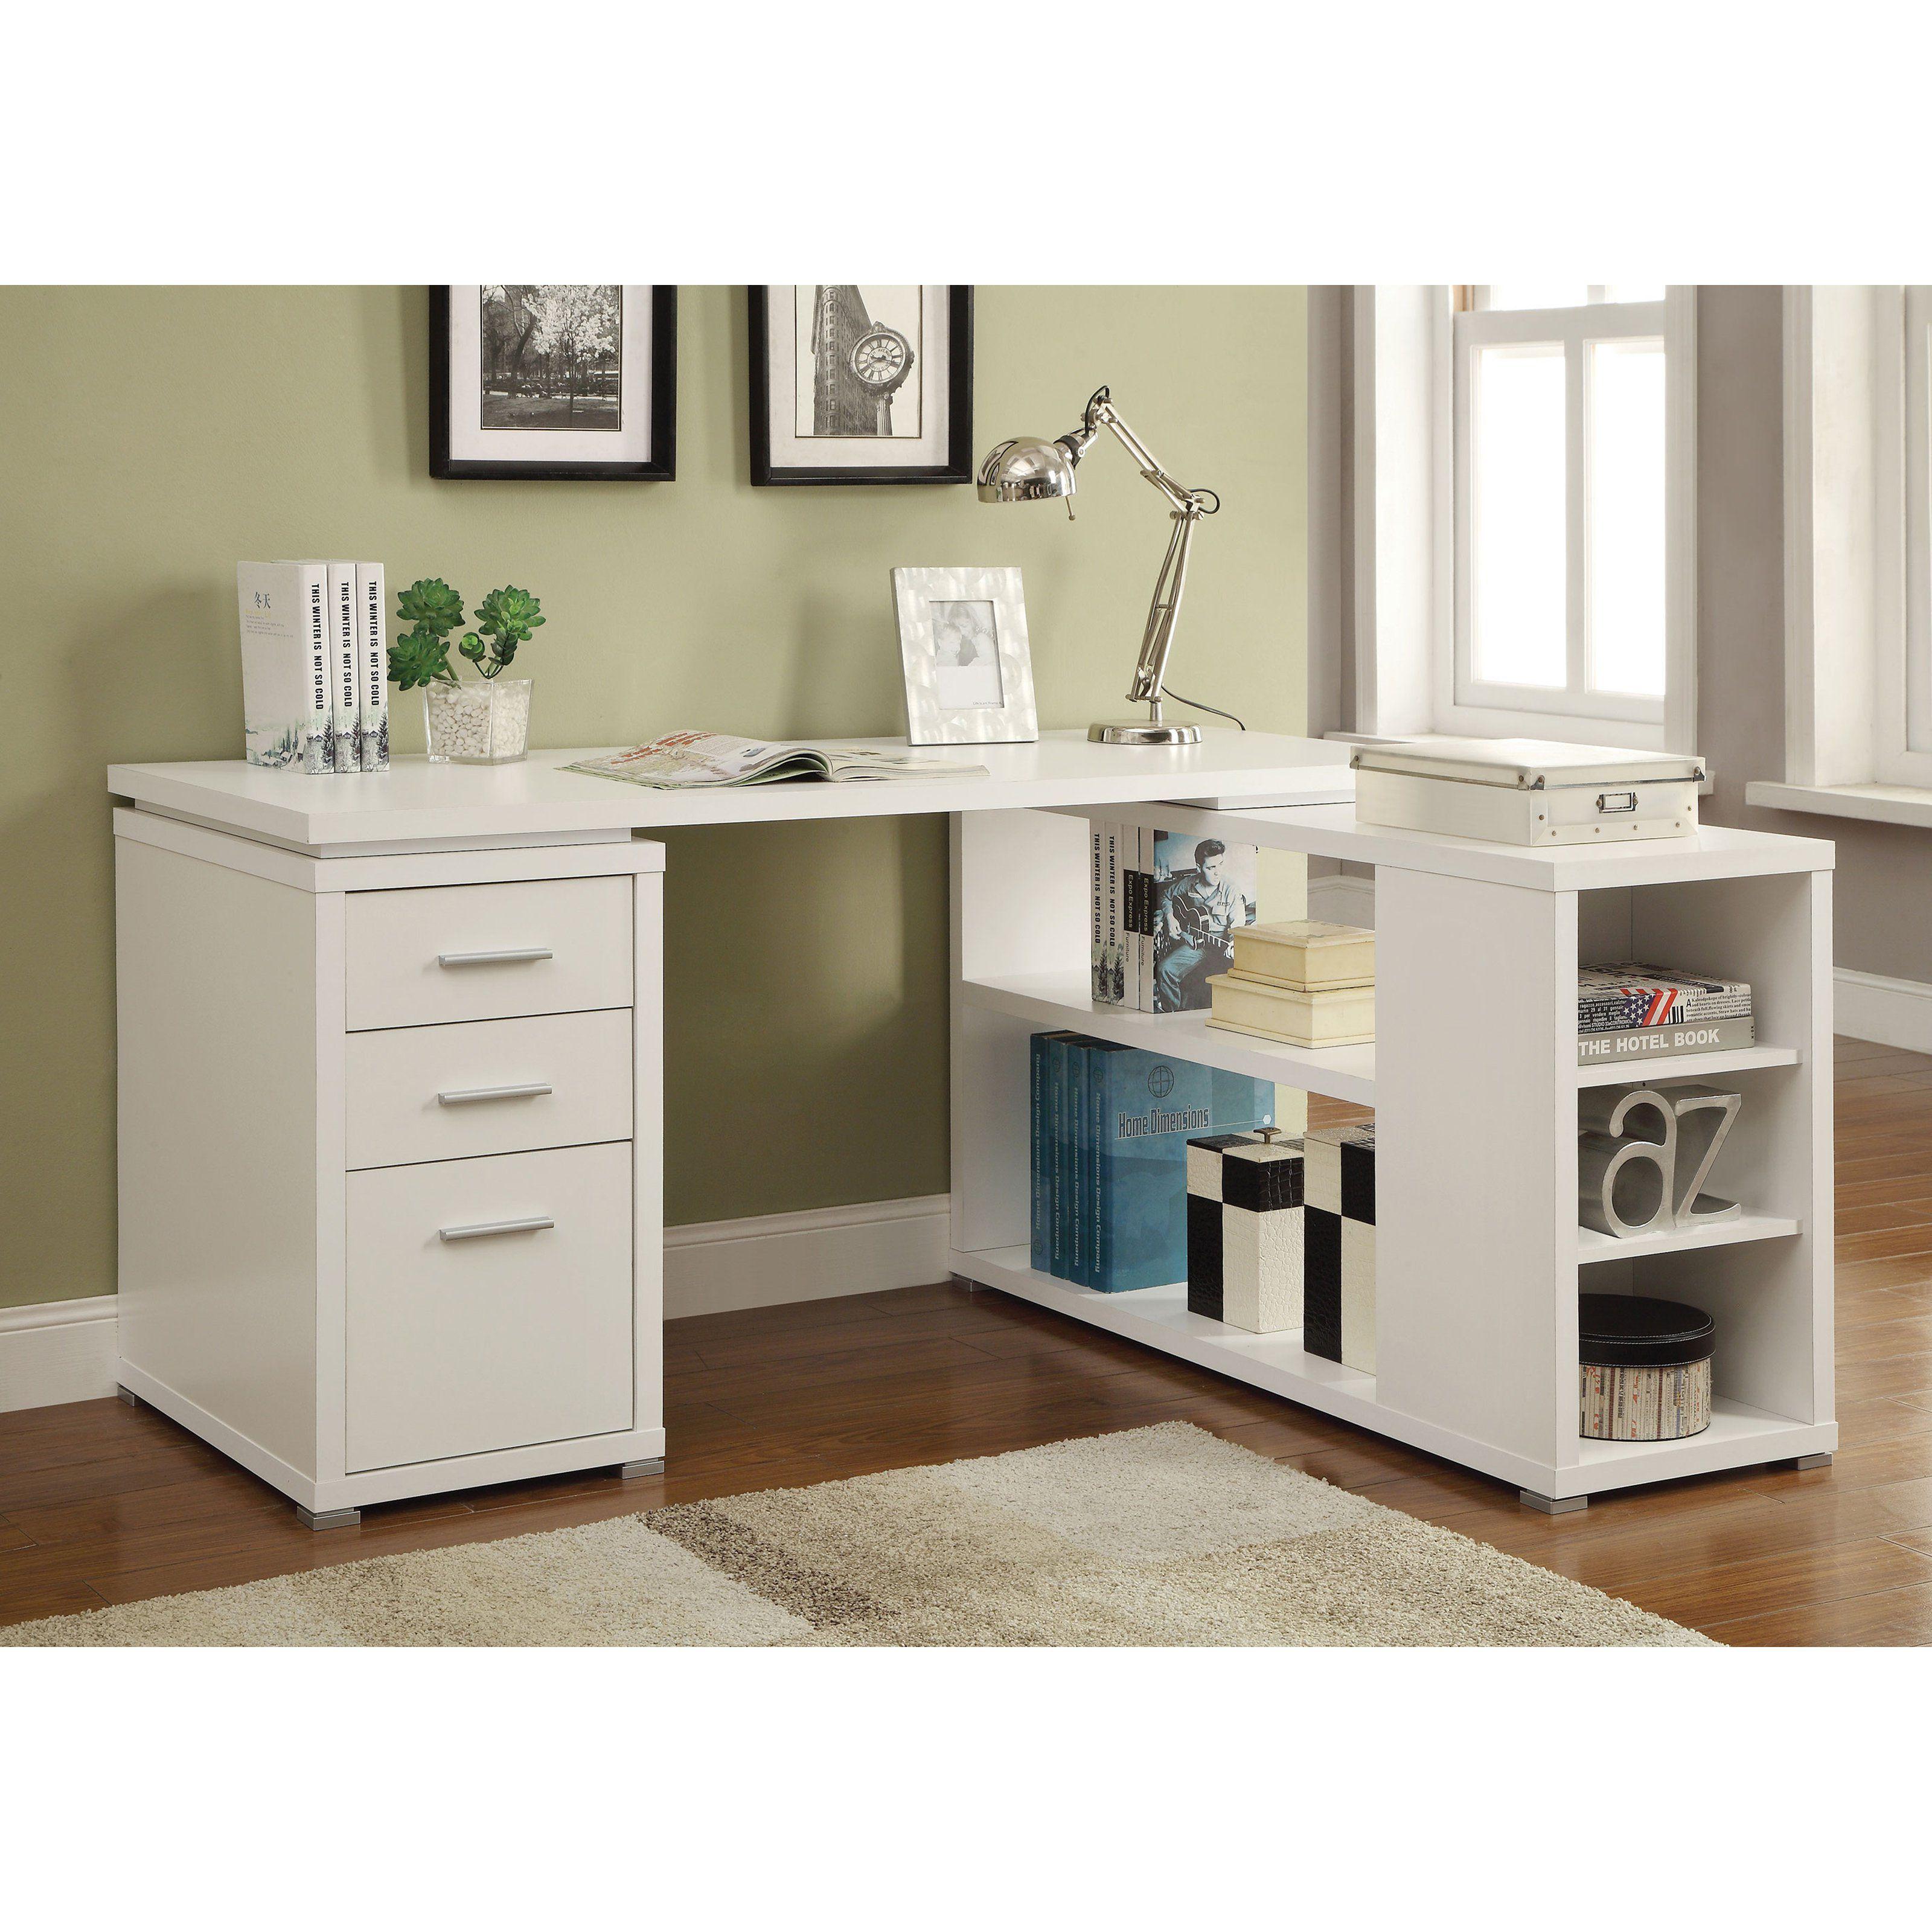 Coaster Furniture Yvette Office Desk From Hayneedle Com  # Muebles Coaster